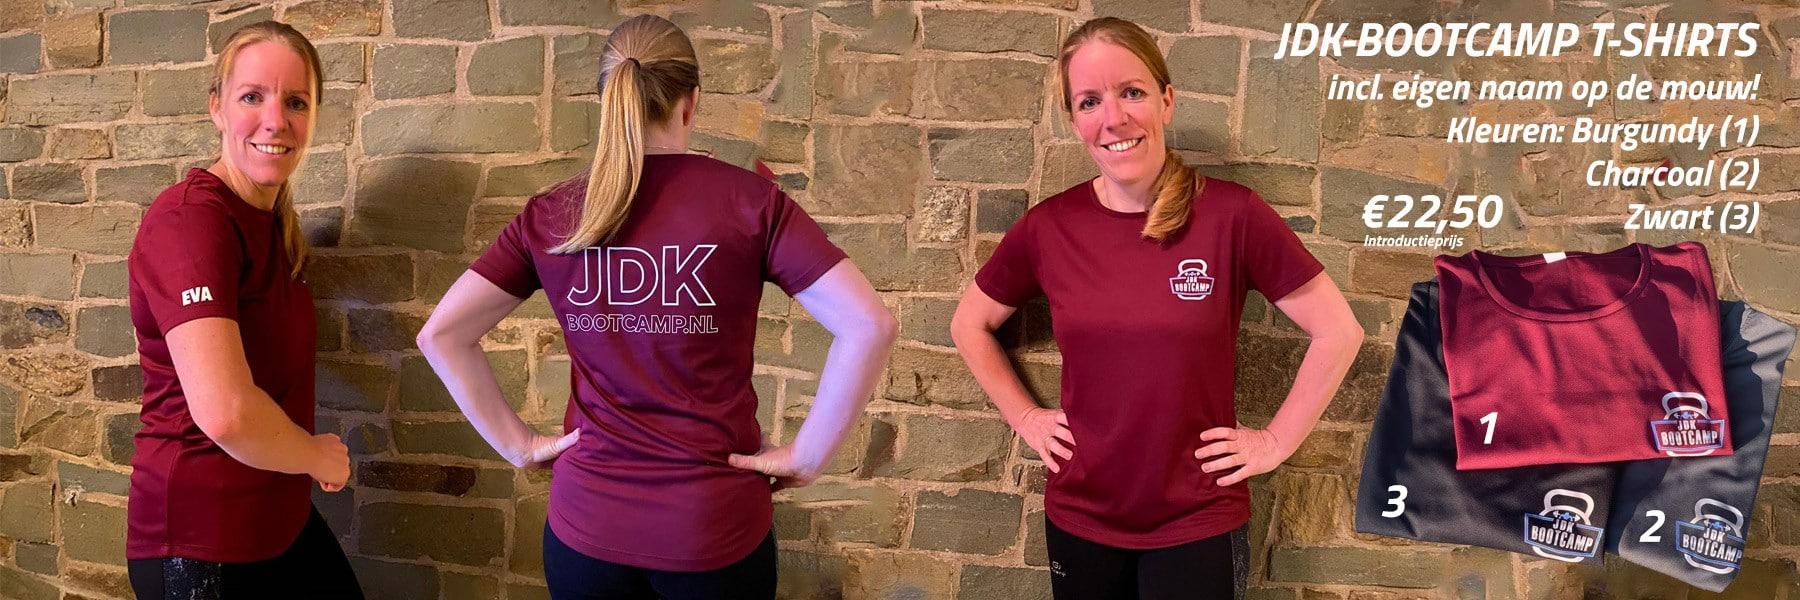 JDK-BOOTCAMP t-shirts te koop